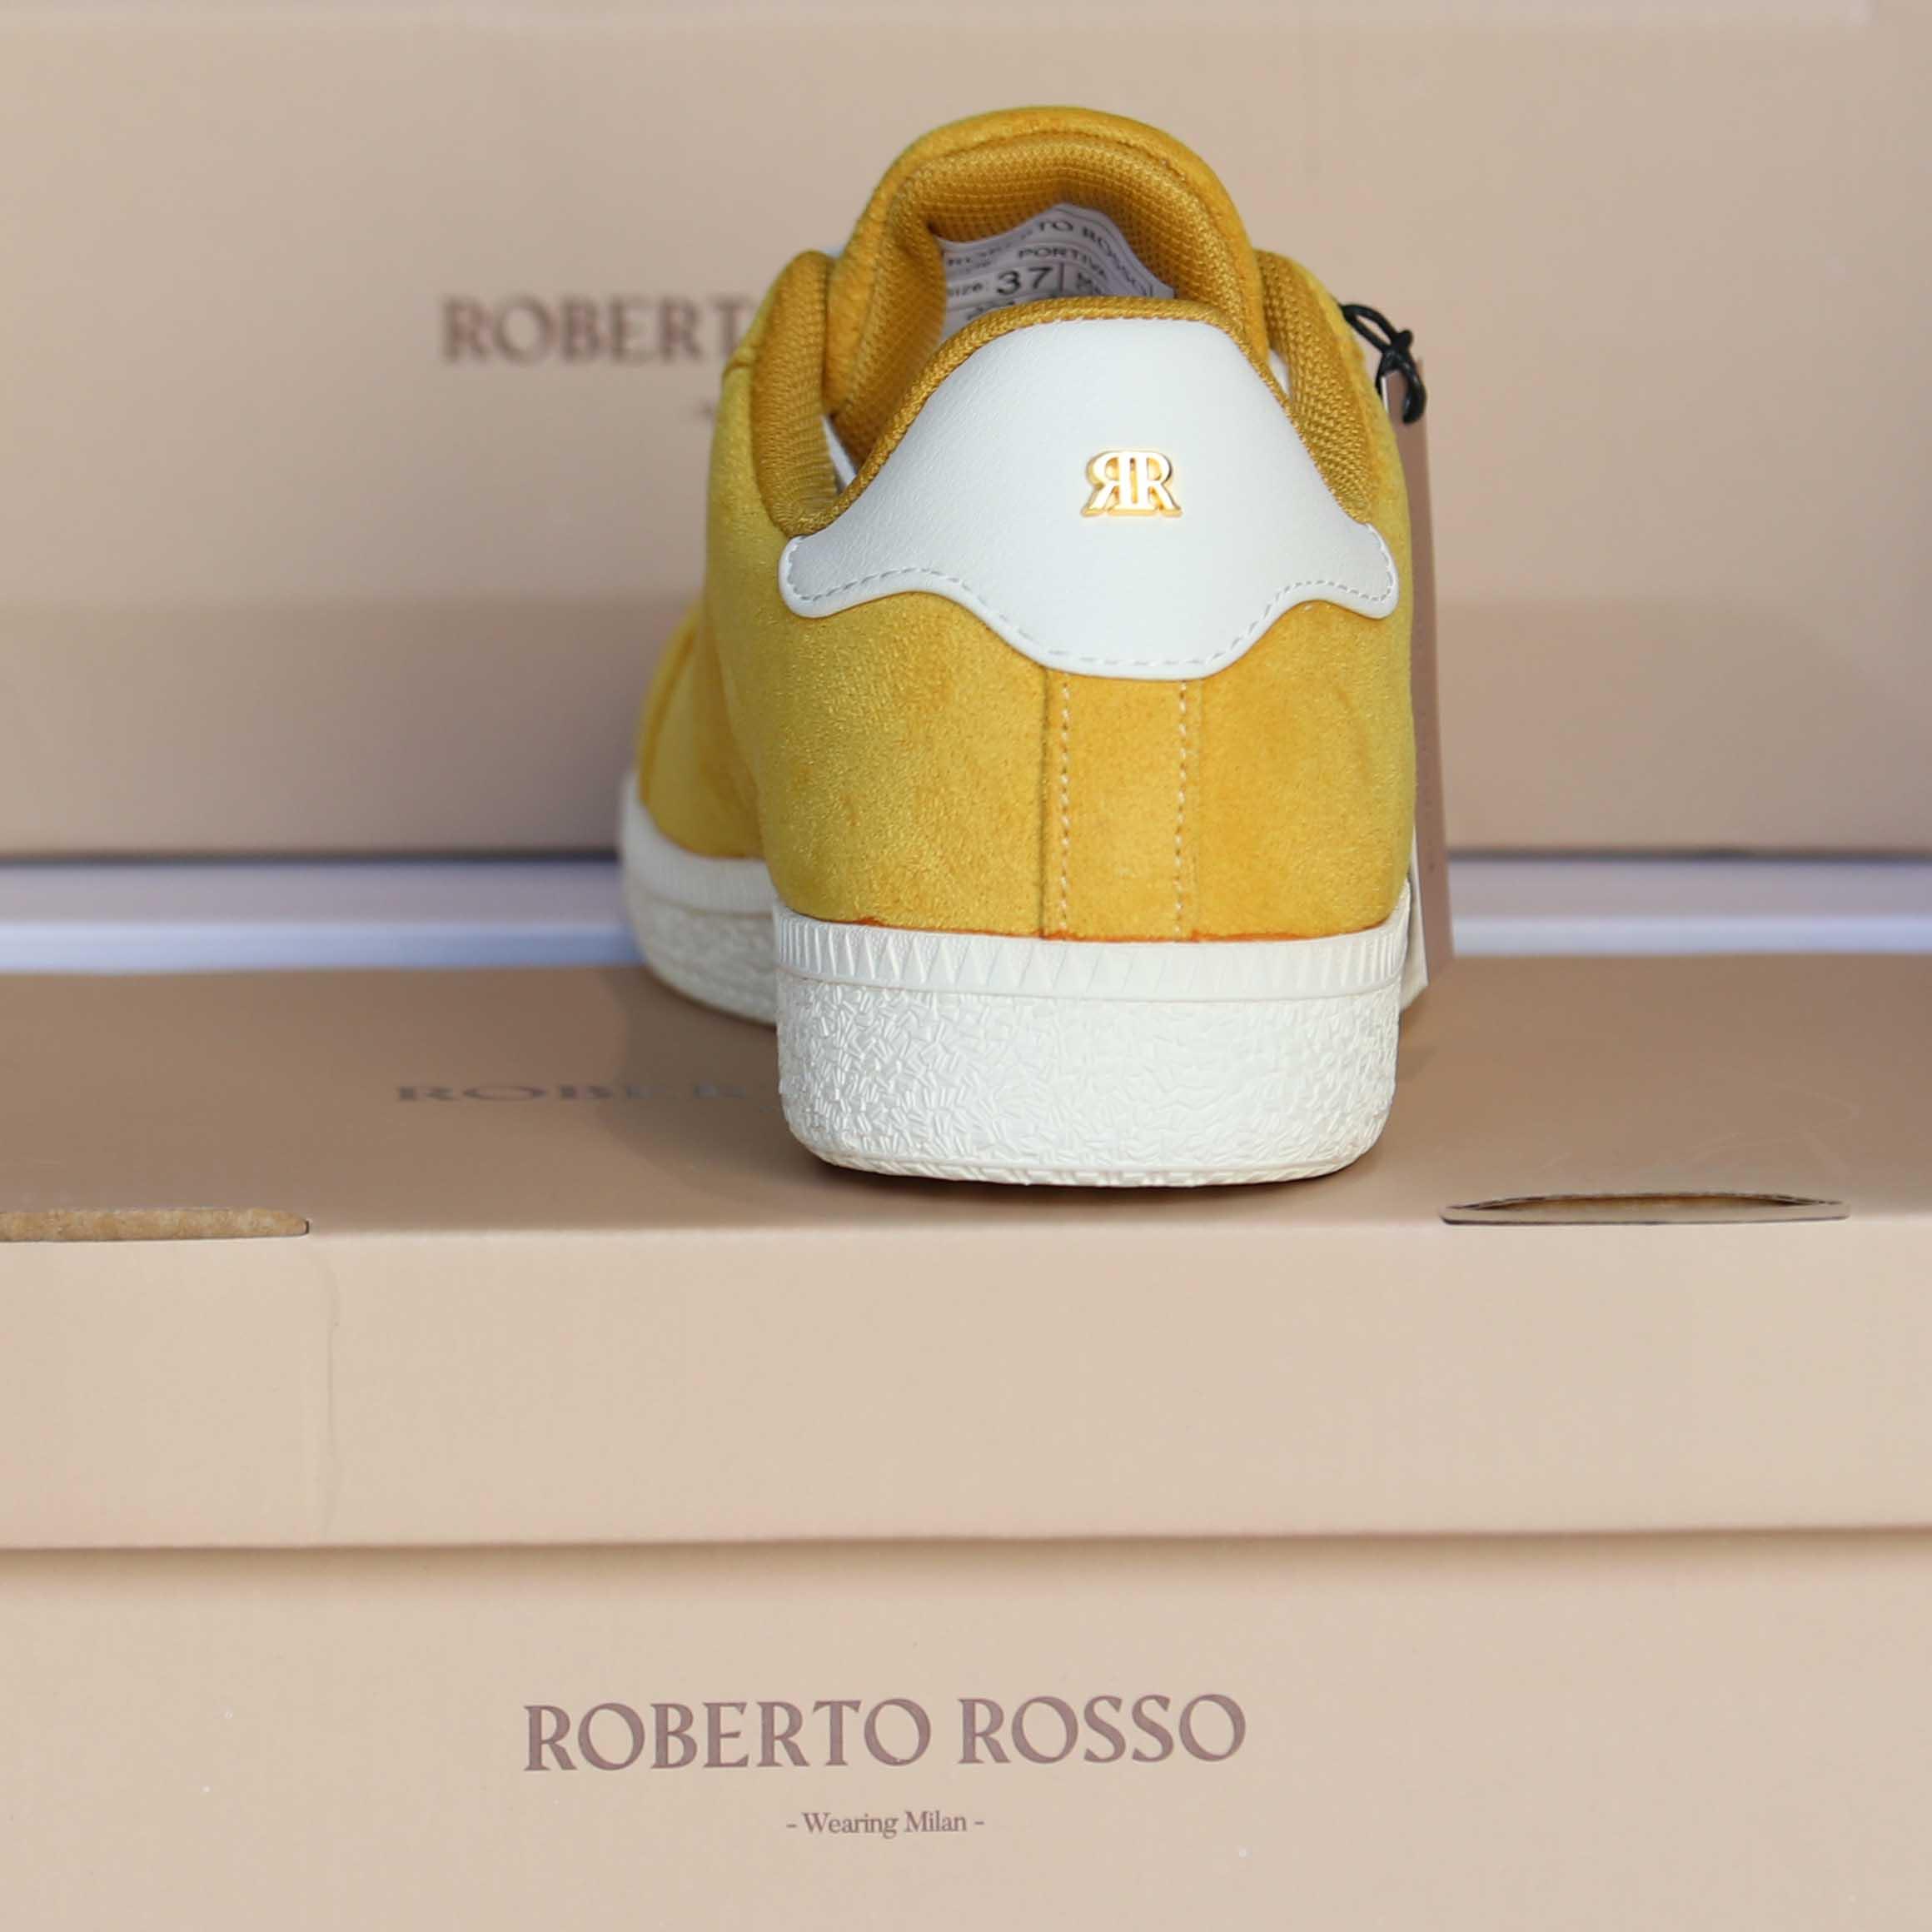 roberto rosso portiva yellow dame sko sommer3